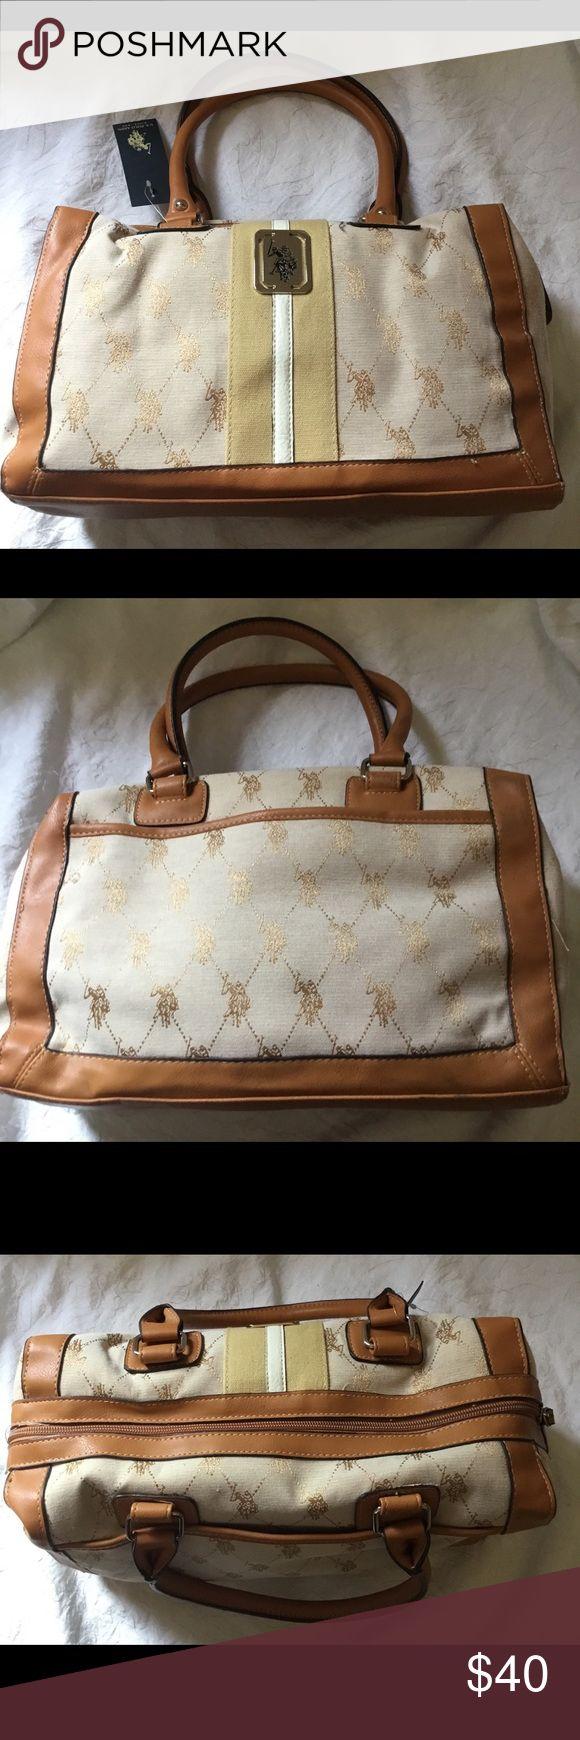 U. S. Polo ASSN Handbag Brand new with tags Bags Shoulder Bags